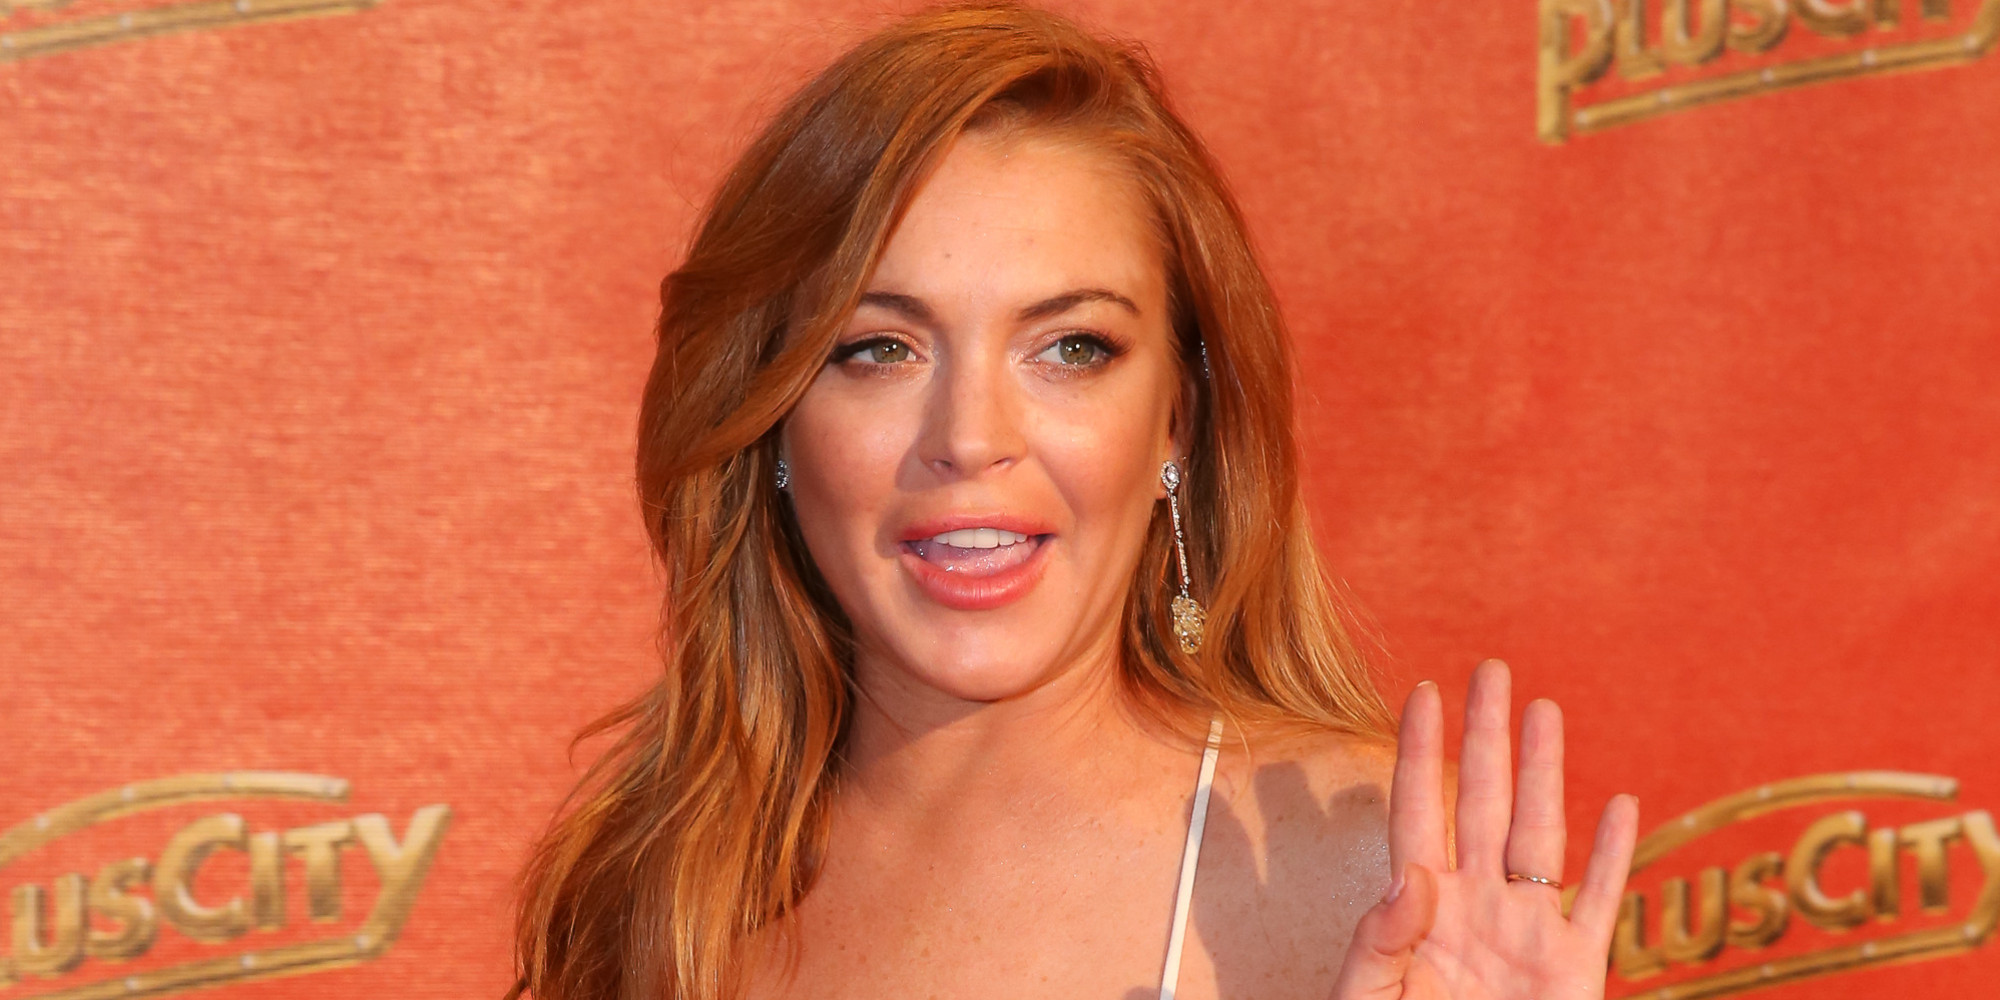 Lindsay Lohan Uploads Bikini Selfie In PoorlyLit Hotel